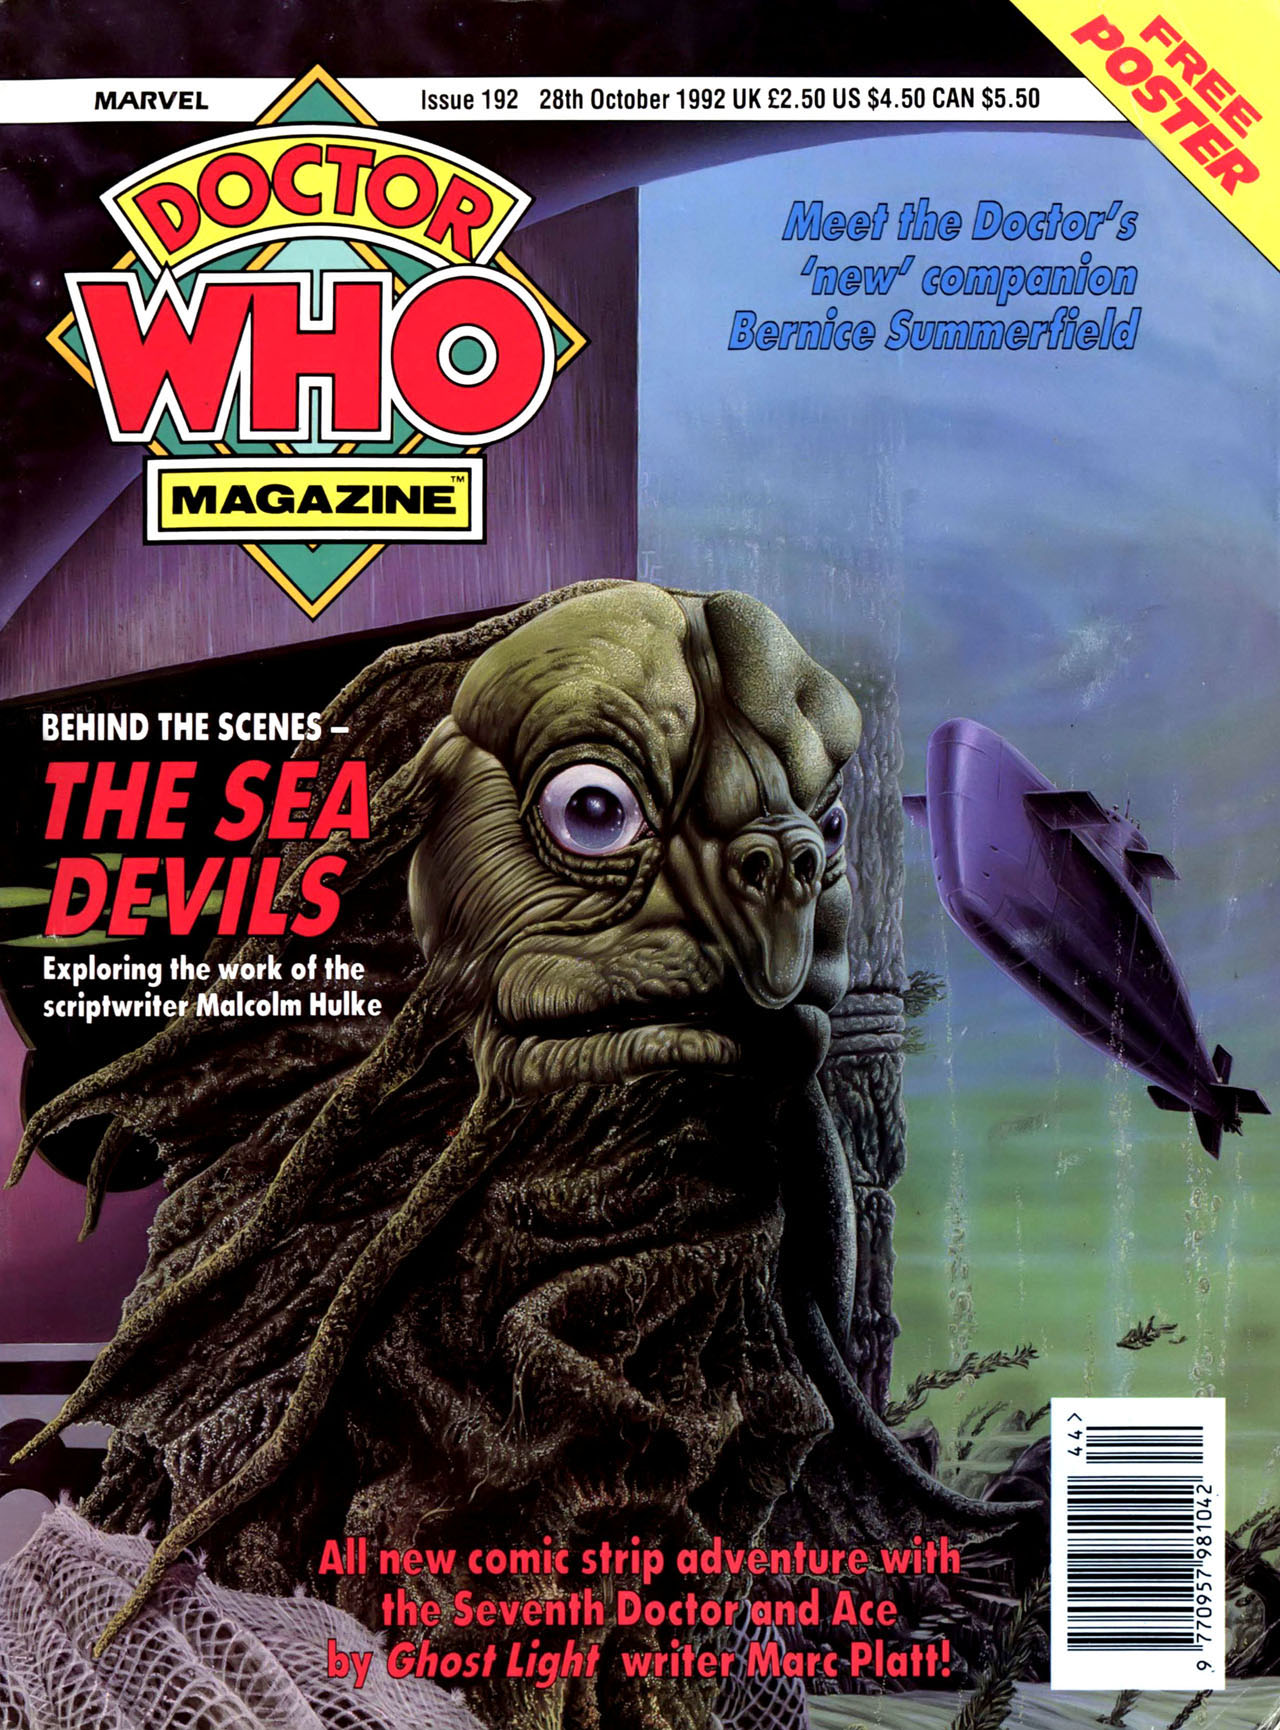 Doctor Who Magazine Vol 1 192